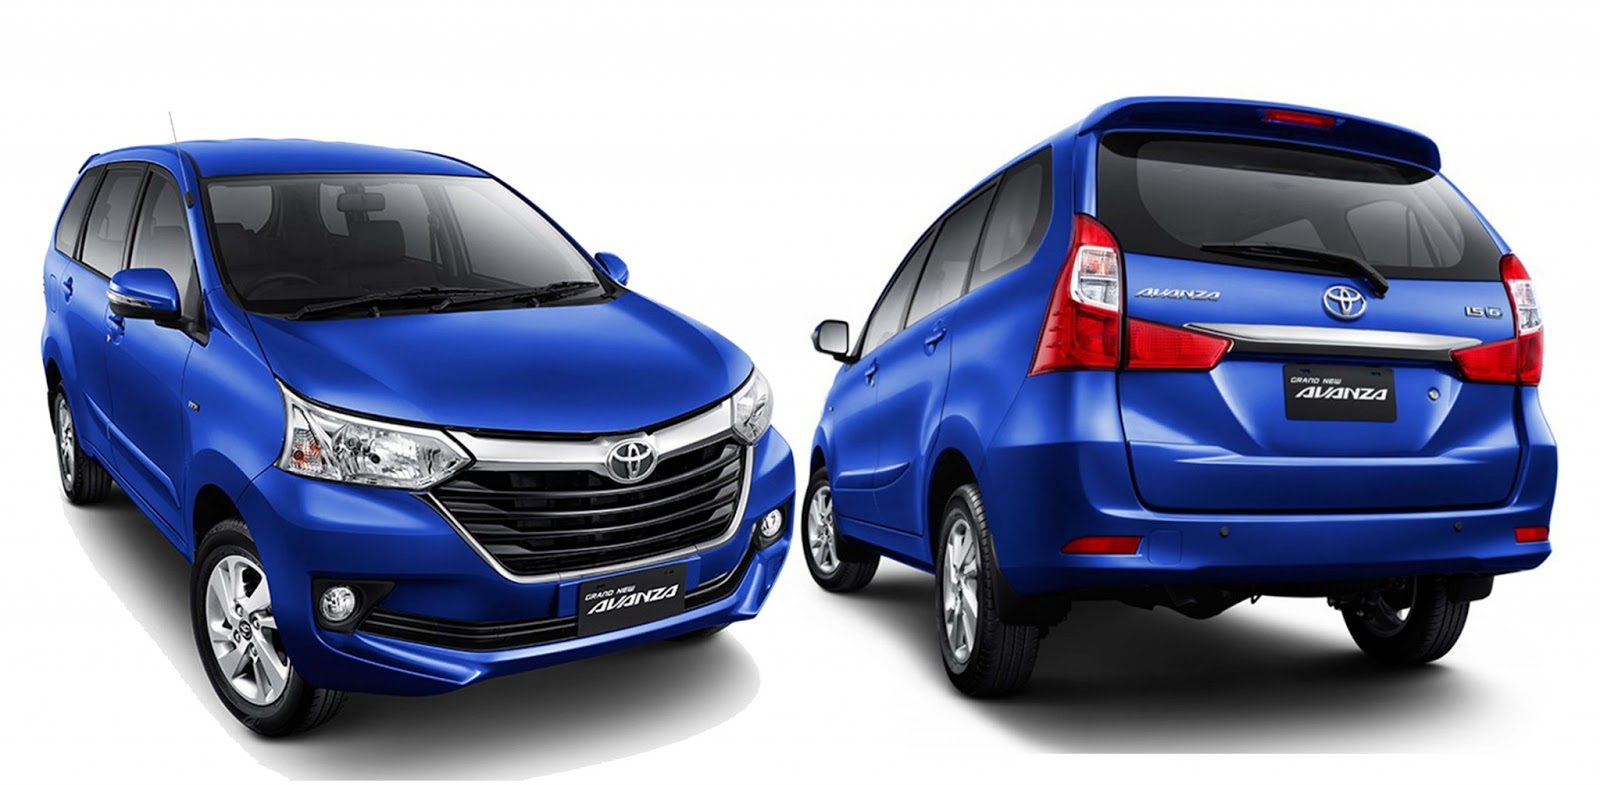 Indikator Grand New Avanza Spesifikasi Kredit Mobil Toyota Bandung Info 0812 2248 1100